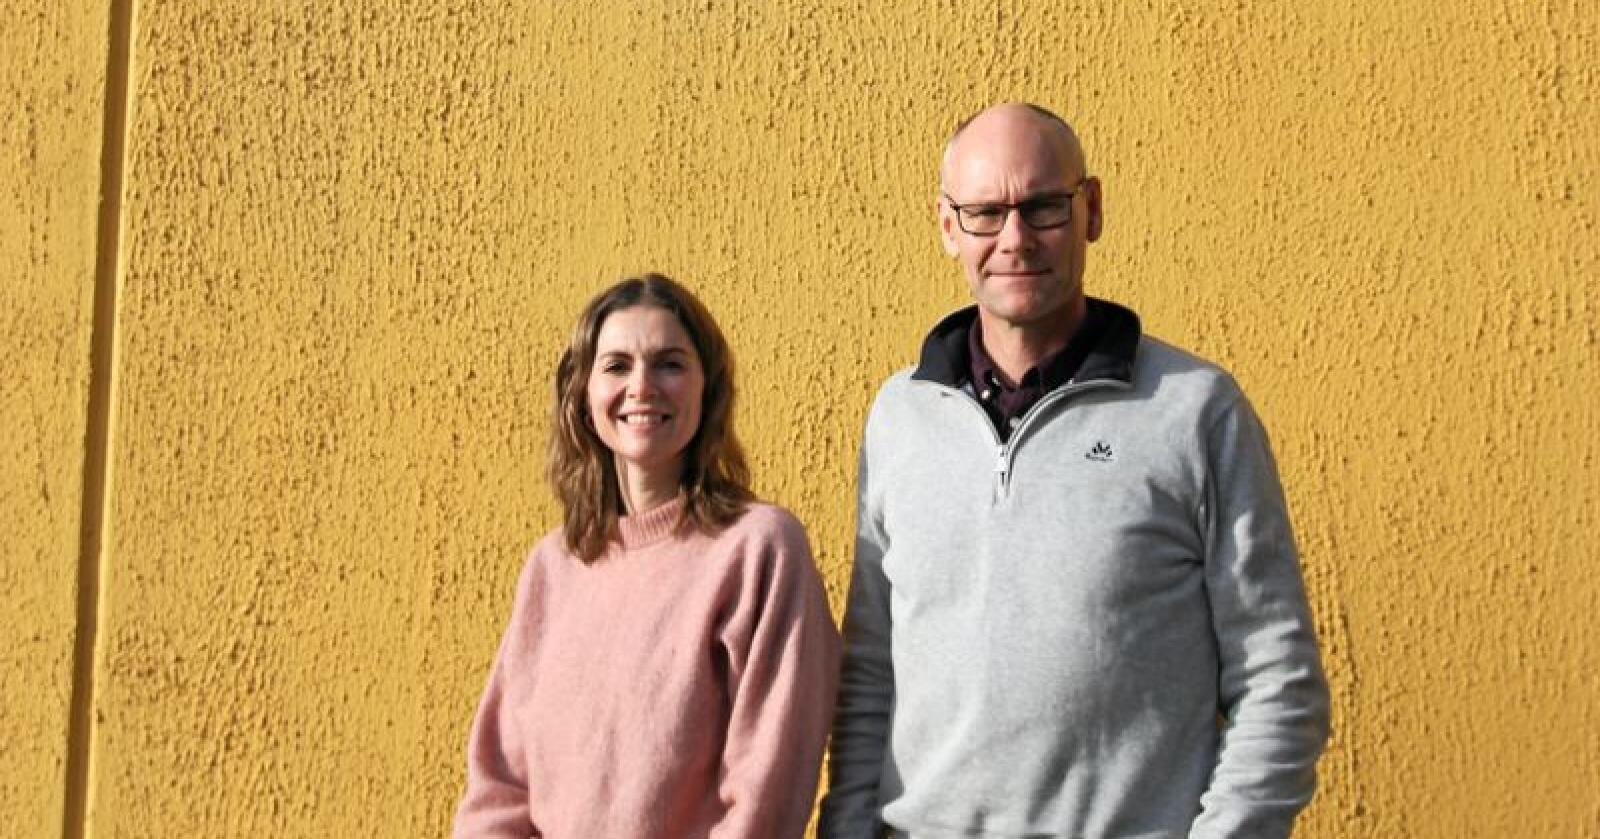 Camilla Larsen (til venstre) og Jarle Bergsjø i Norges Birøkterlag er glad for muligheten til å forske på varroamidd hos bier. Foto: Hanna Taugbøl